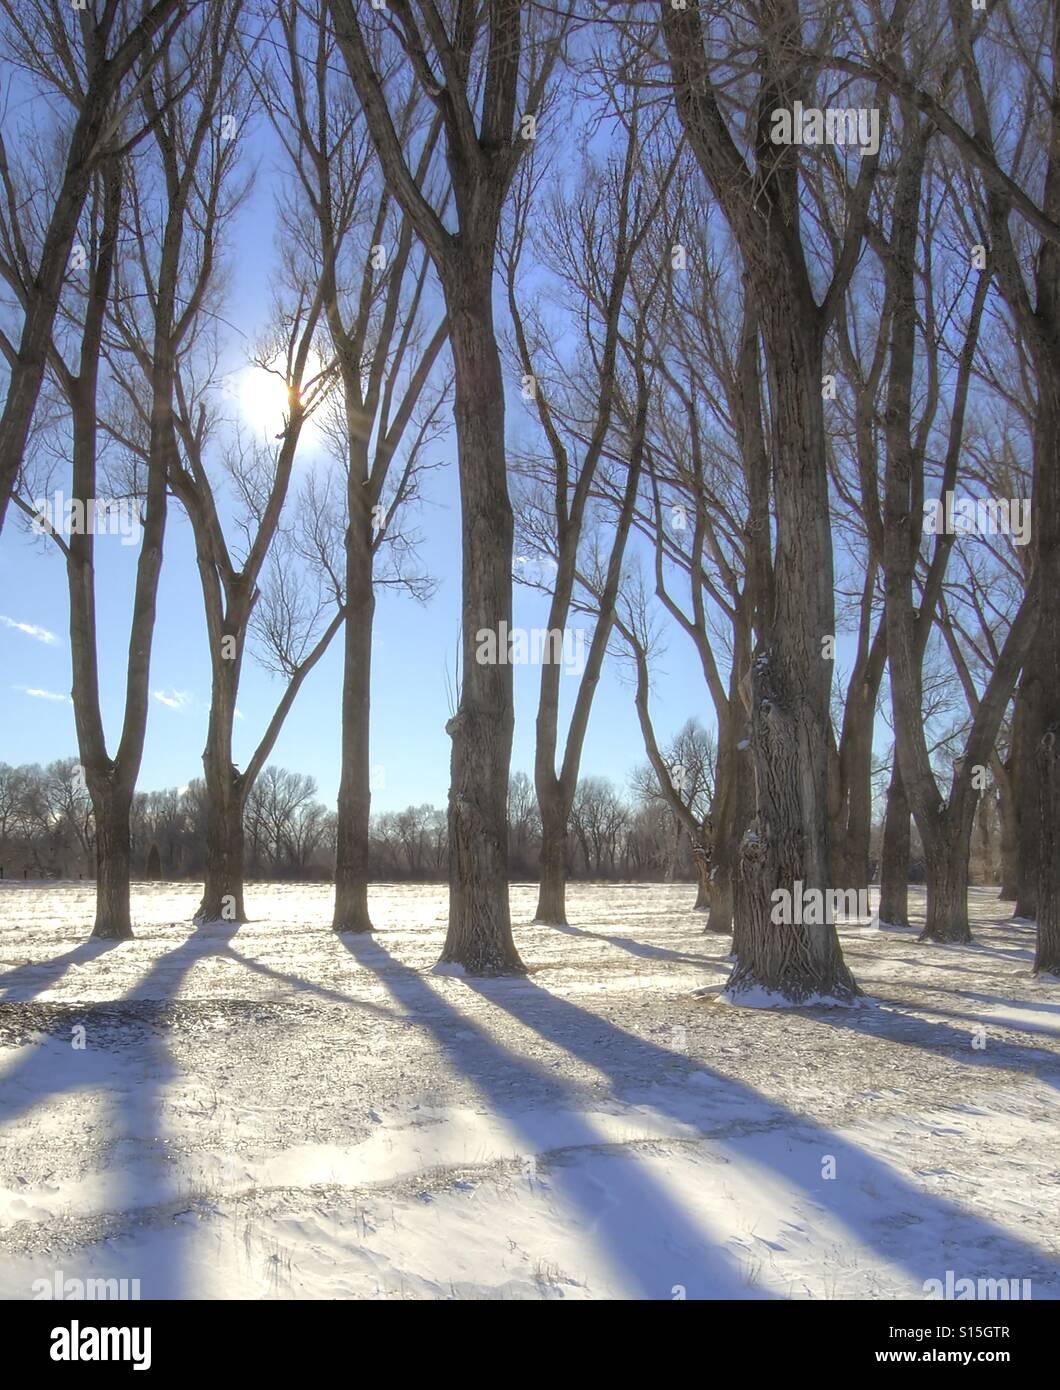 Winter trees in field - Stock Image